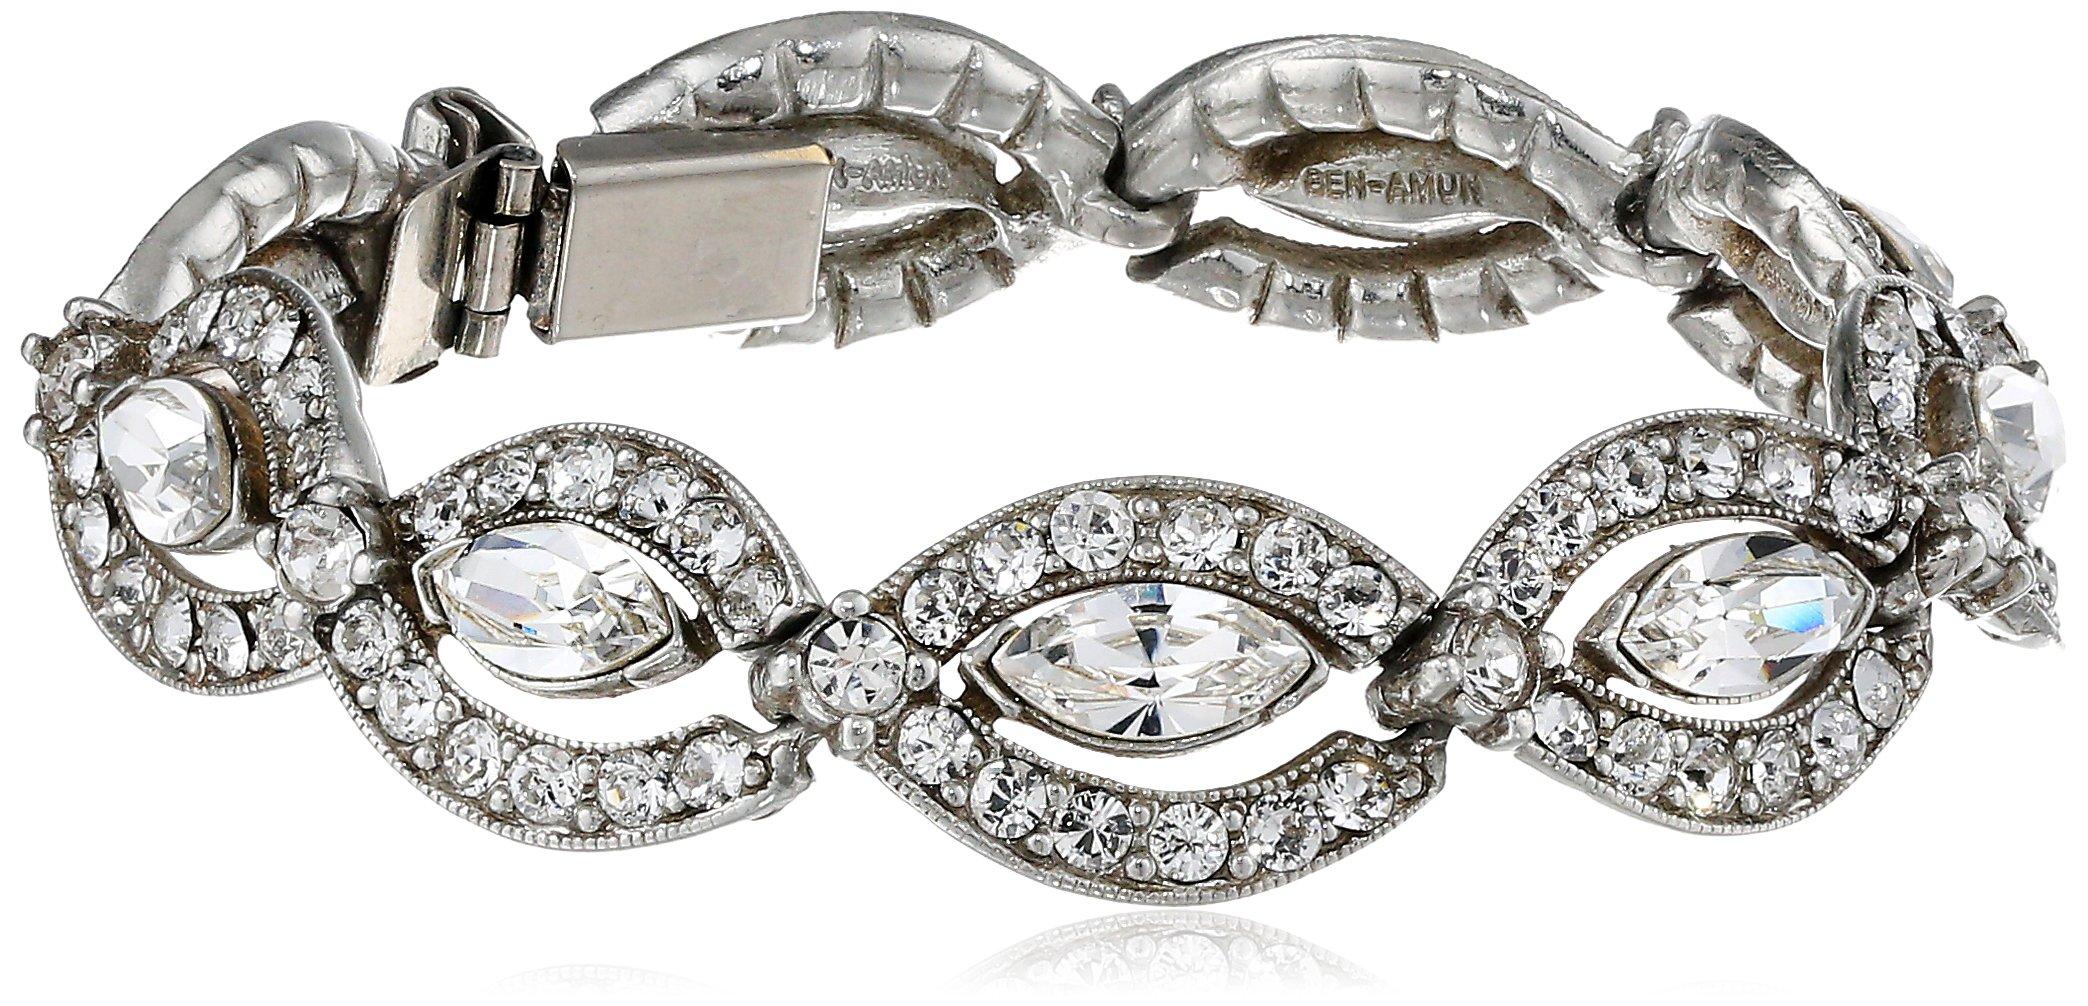 Ben-Amun Jewelry Navette Clear Crystal Bracelet, 6.75''